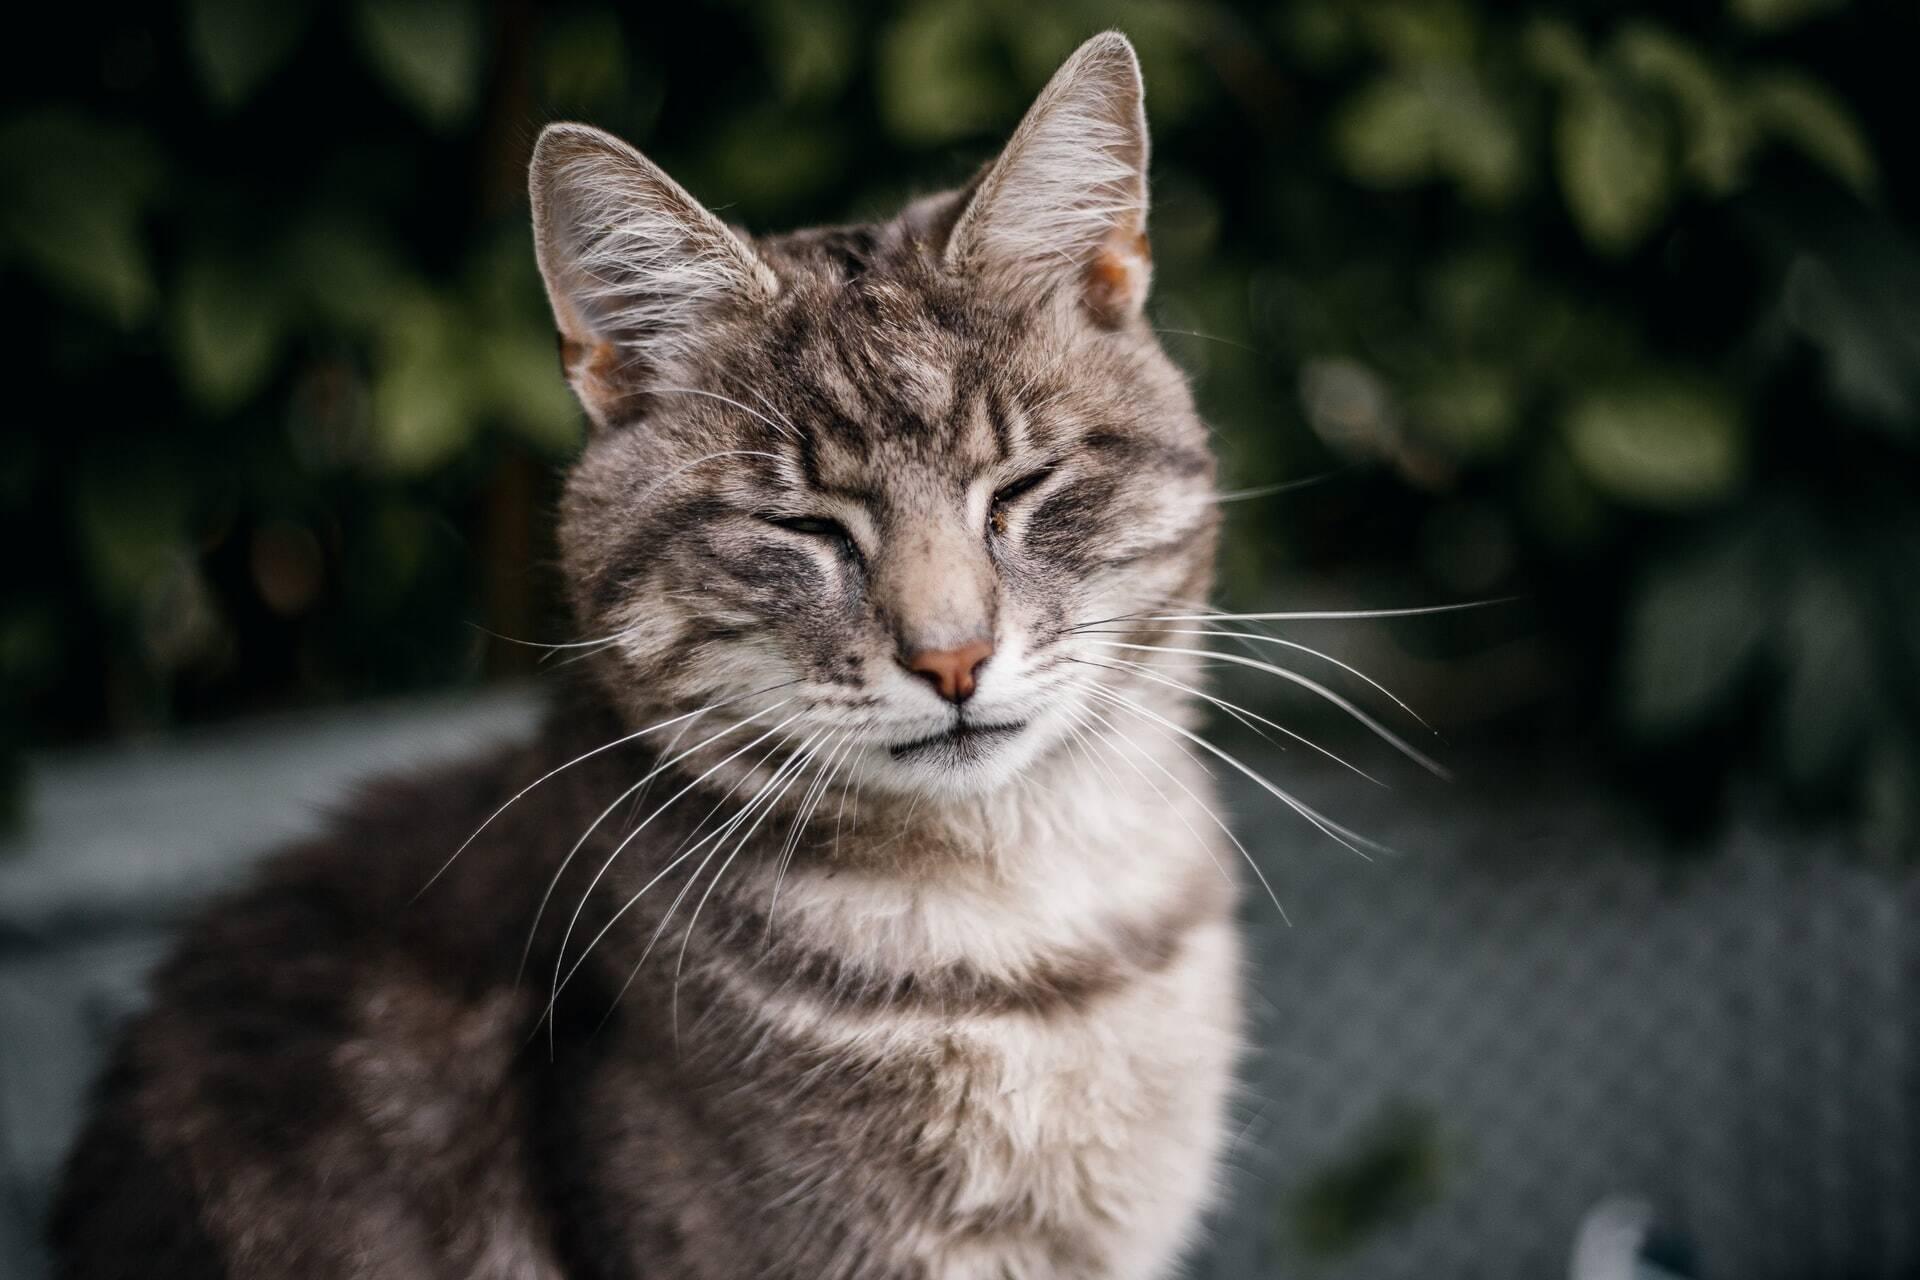 6 dicas para manter o seu gato sempre feliz e ronronando